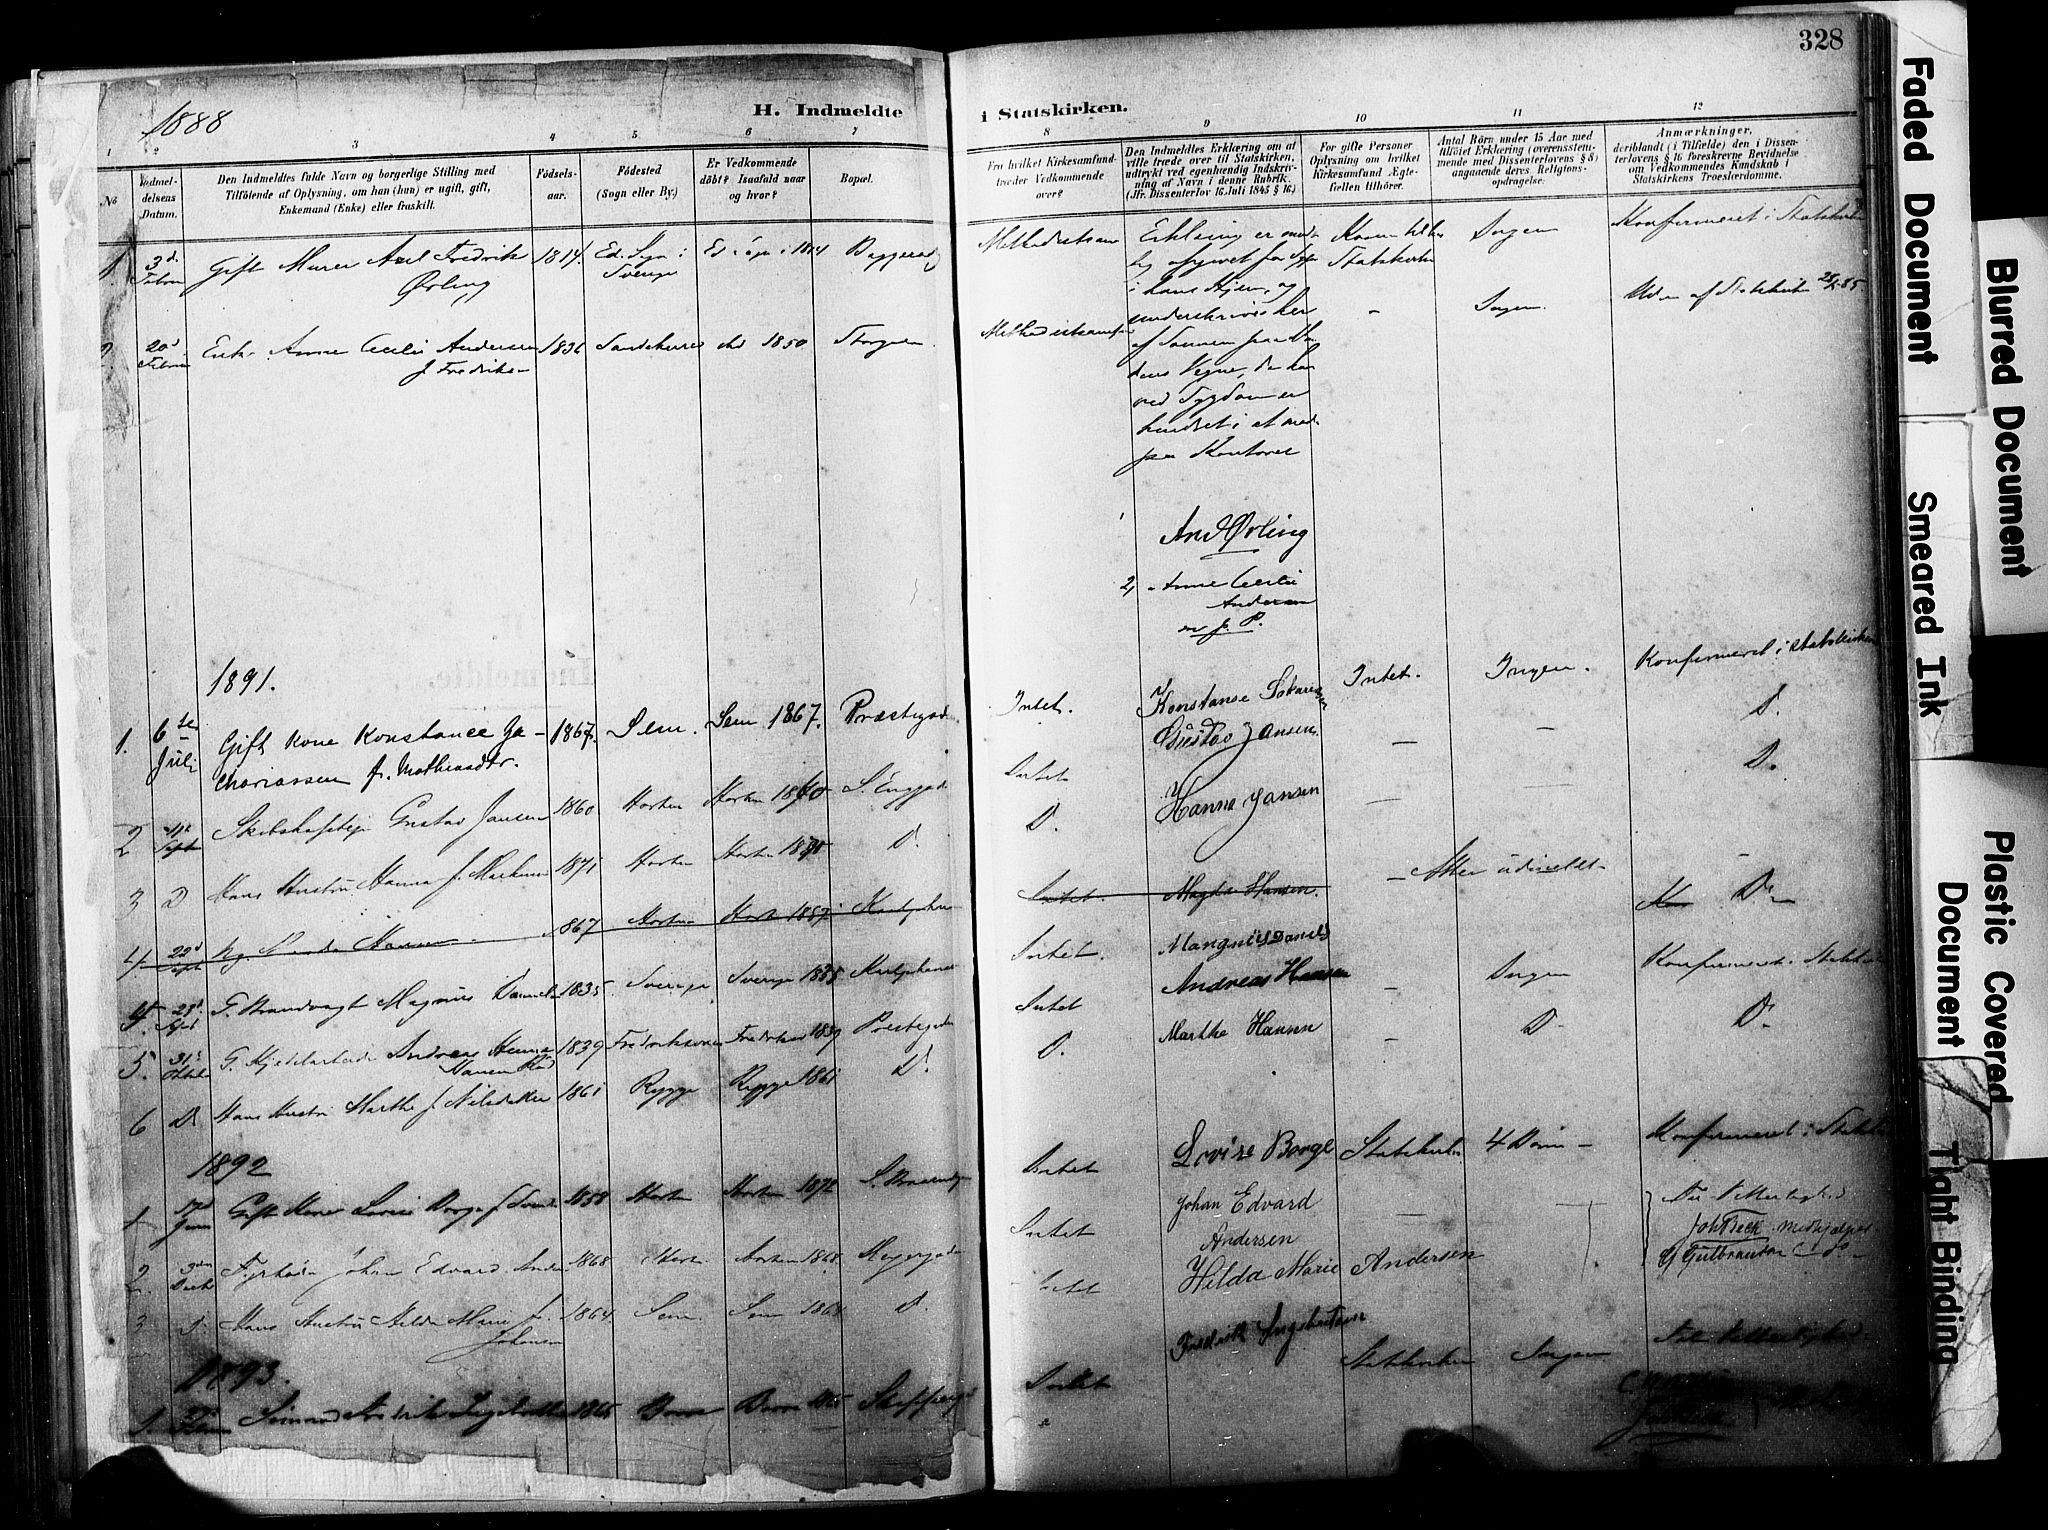 SAKO, Horten kirkebøker, F/Fa/L0004: Parish register (official) no. 4, 1888-1895, p. 328